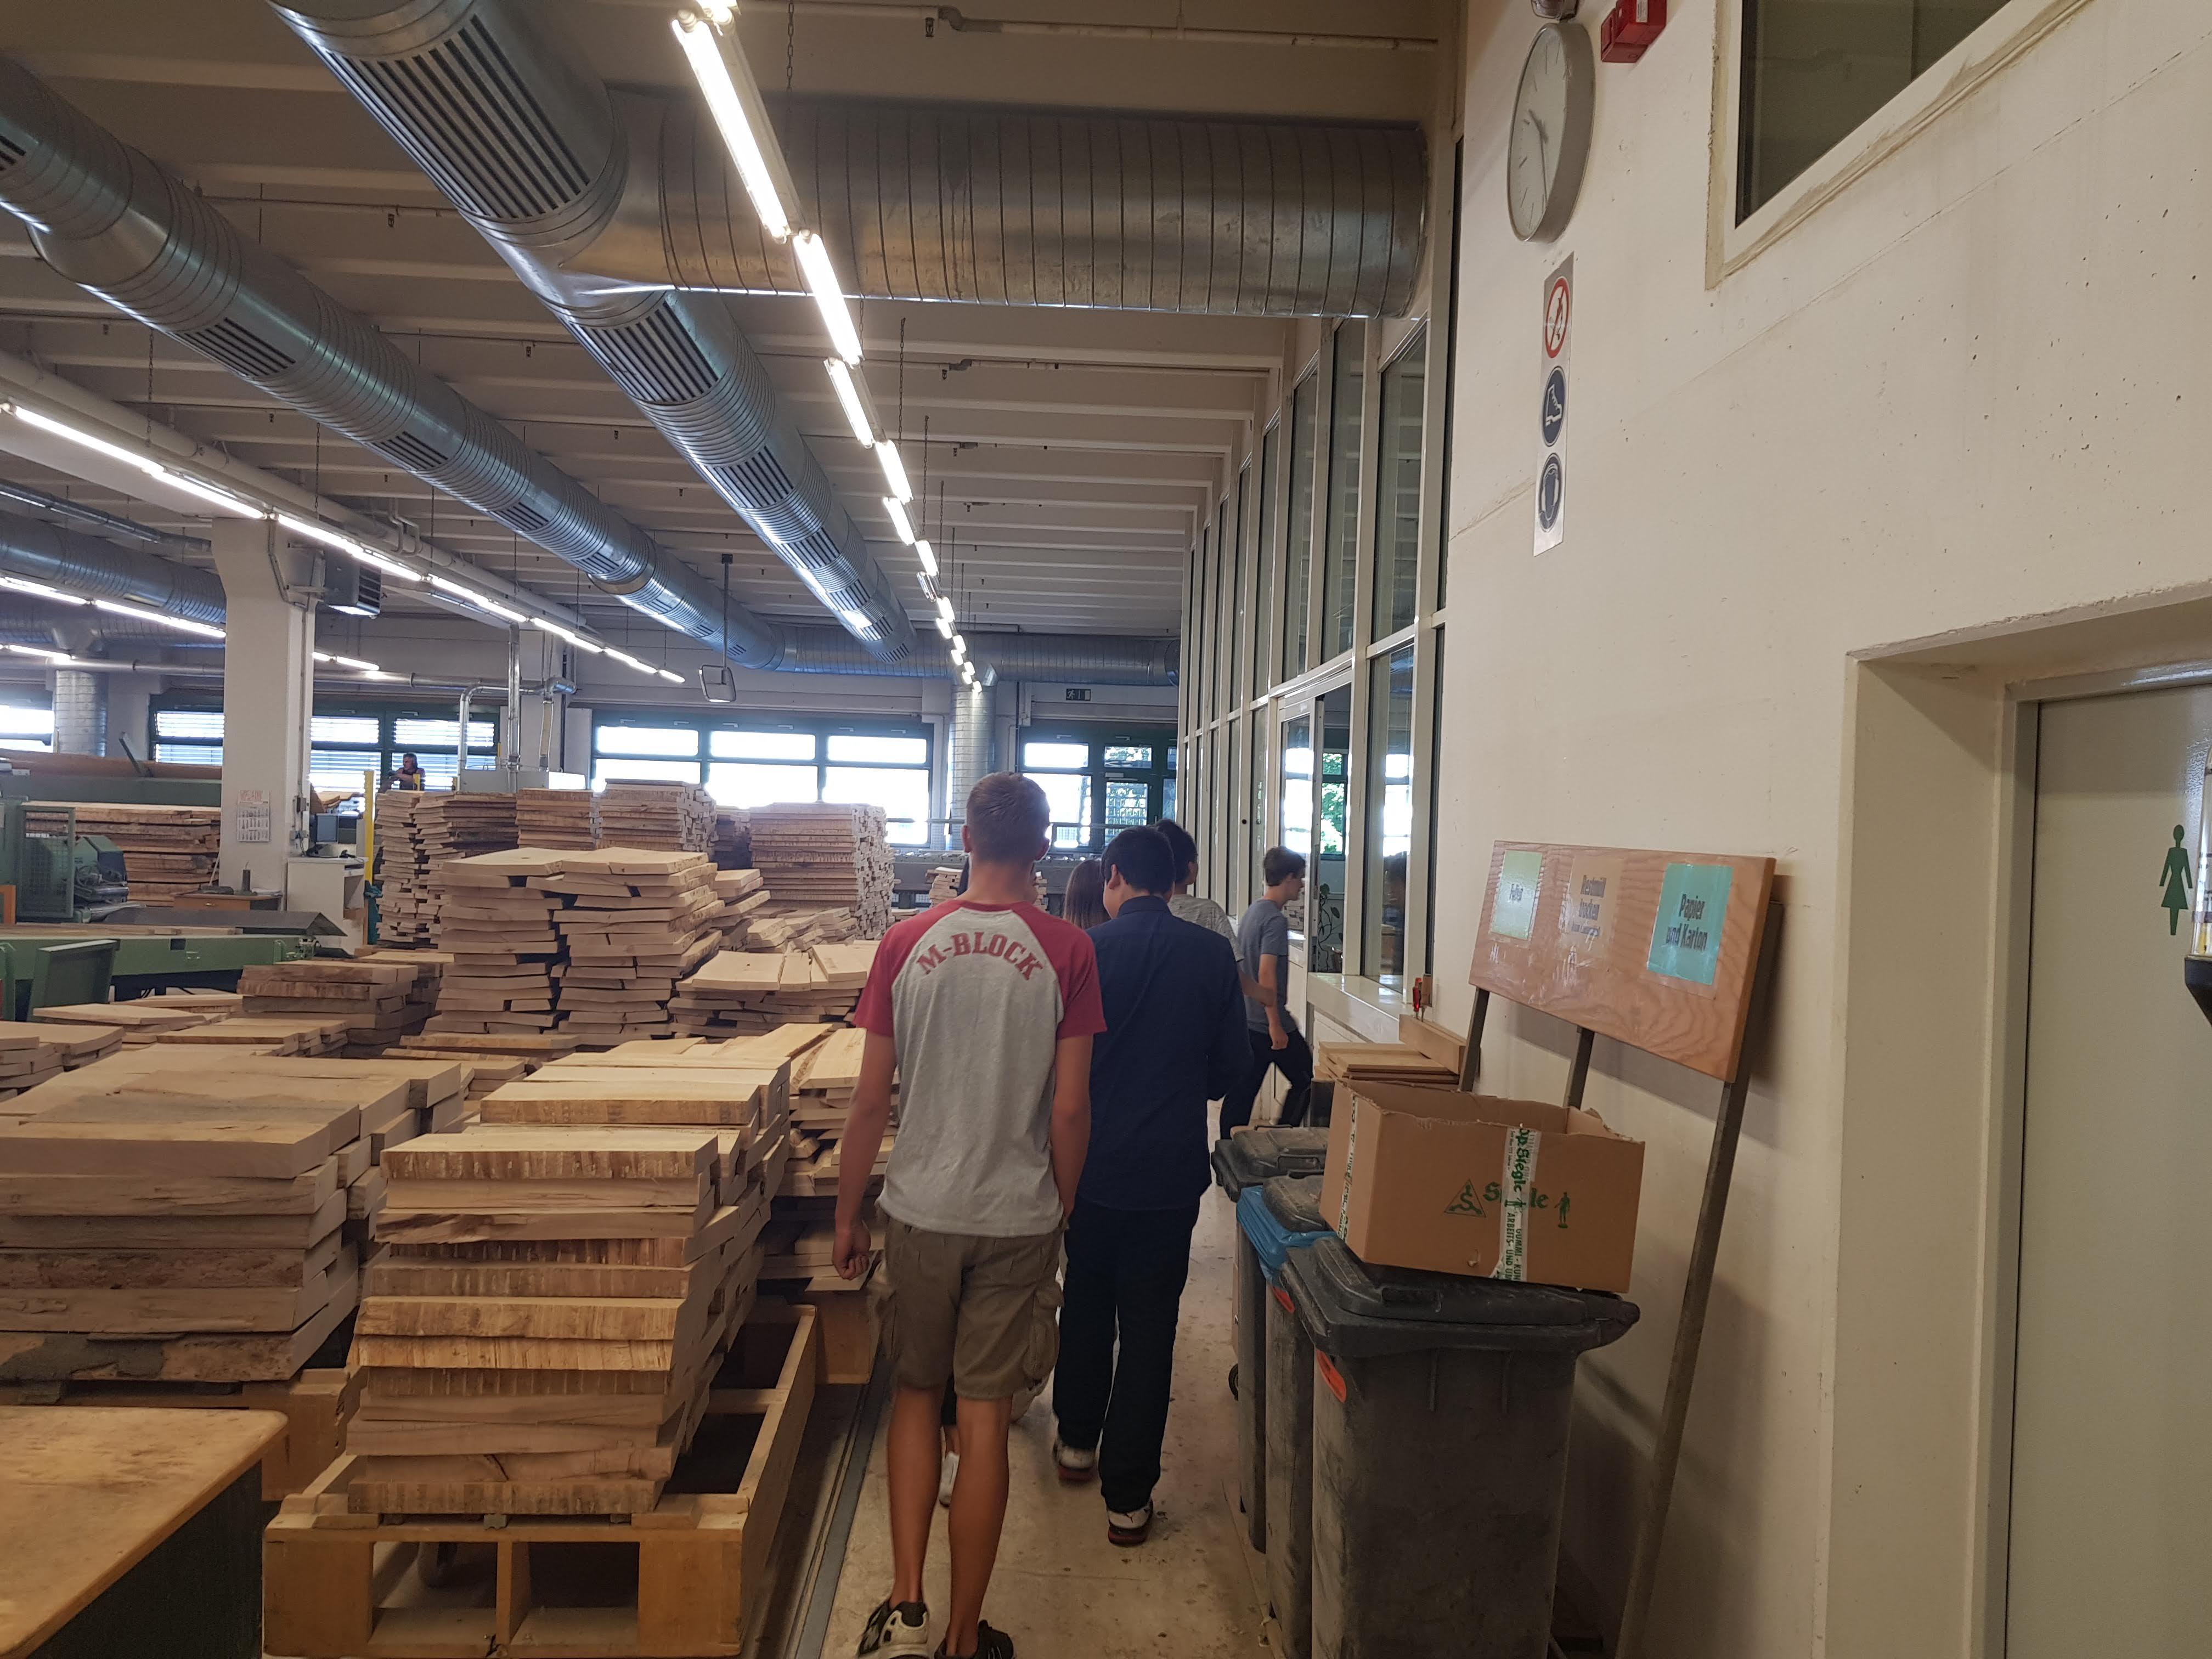 Betriebsbesichtigung Bei Der Firma Segmüller In Friedberg